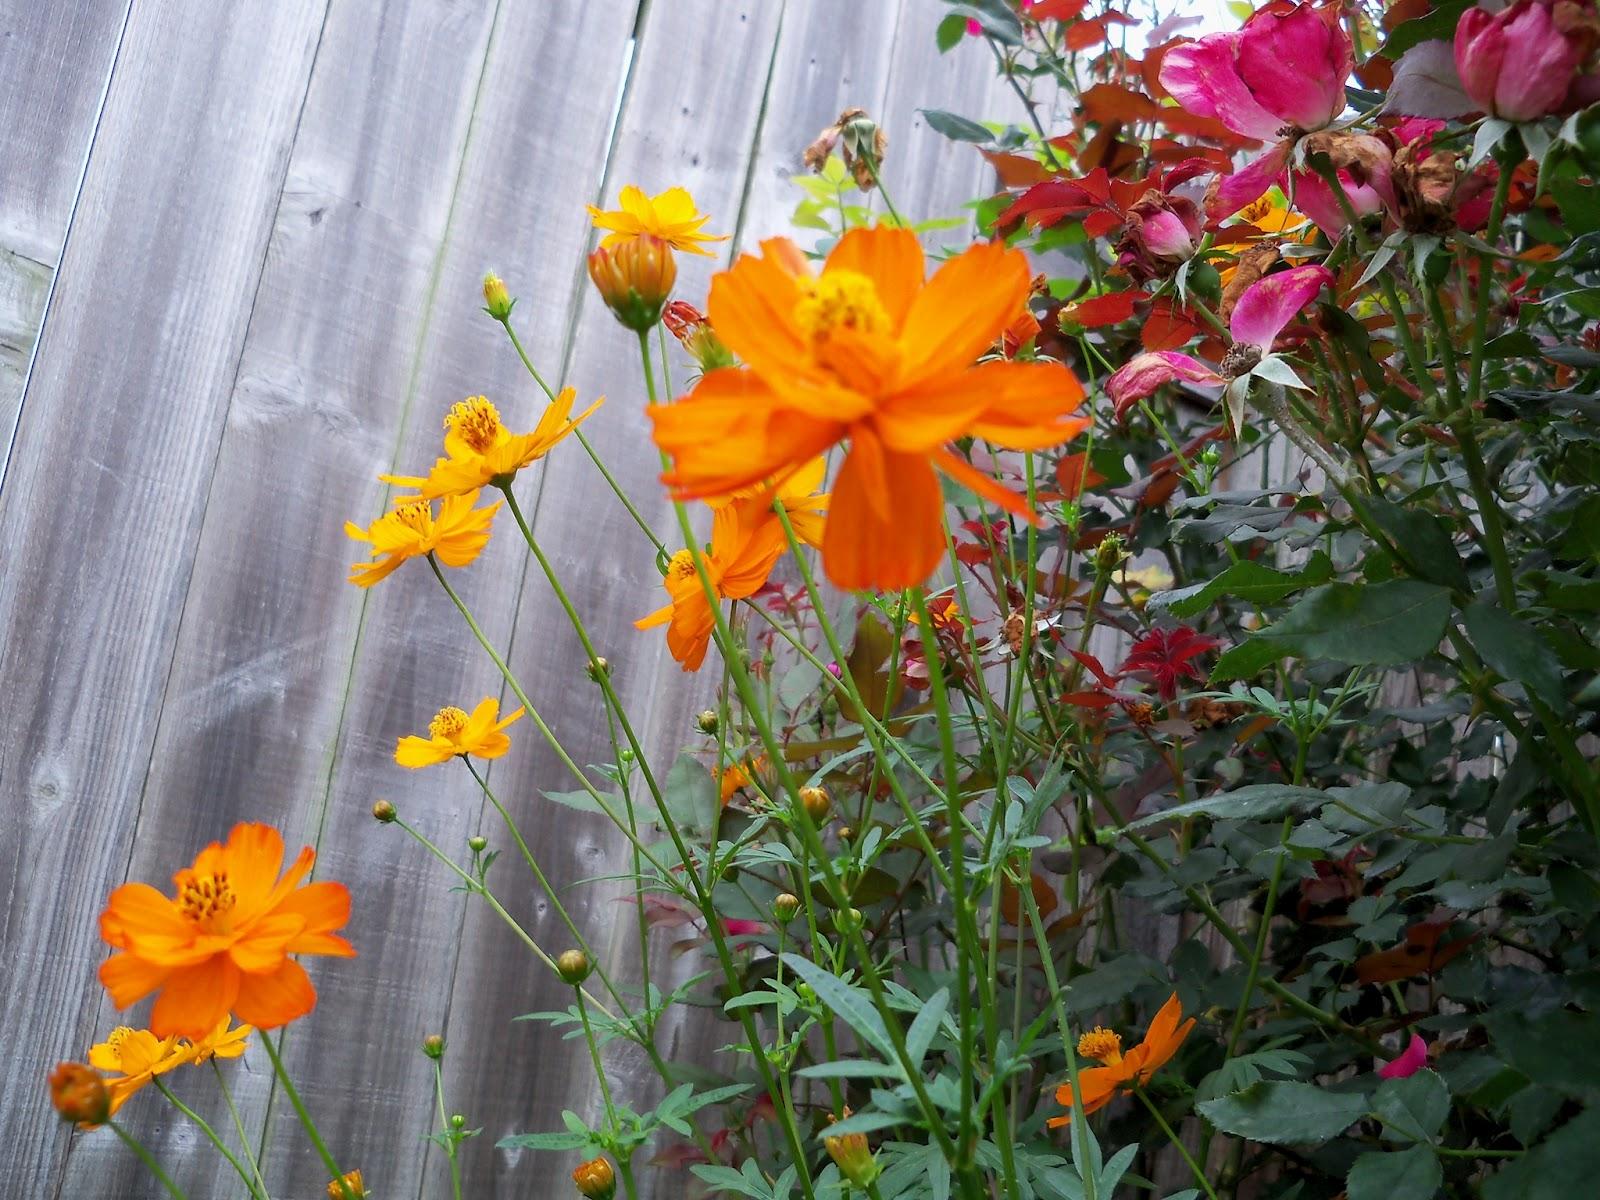 Gardening 2012 - 115_1981.JPG